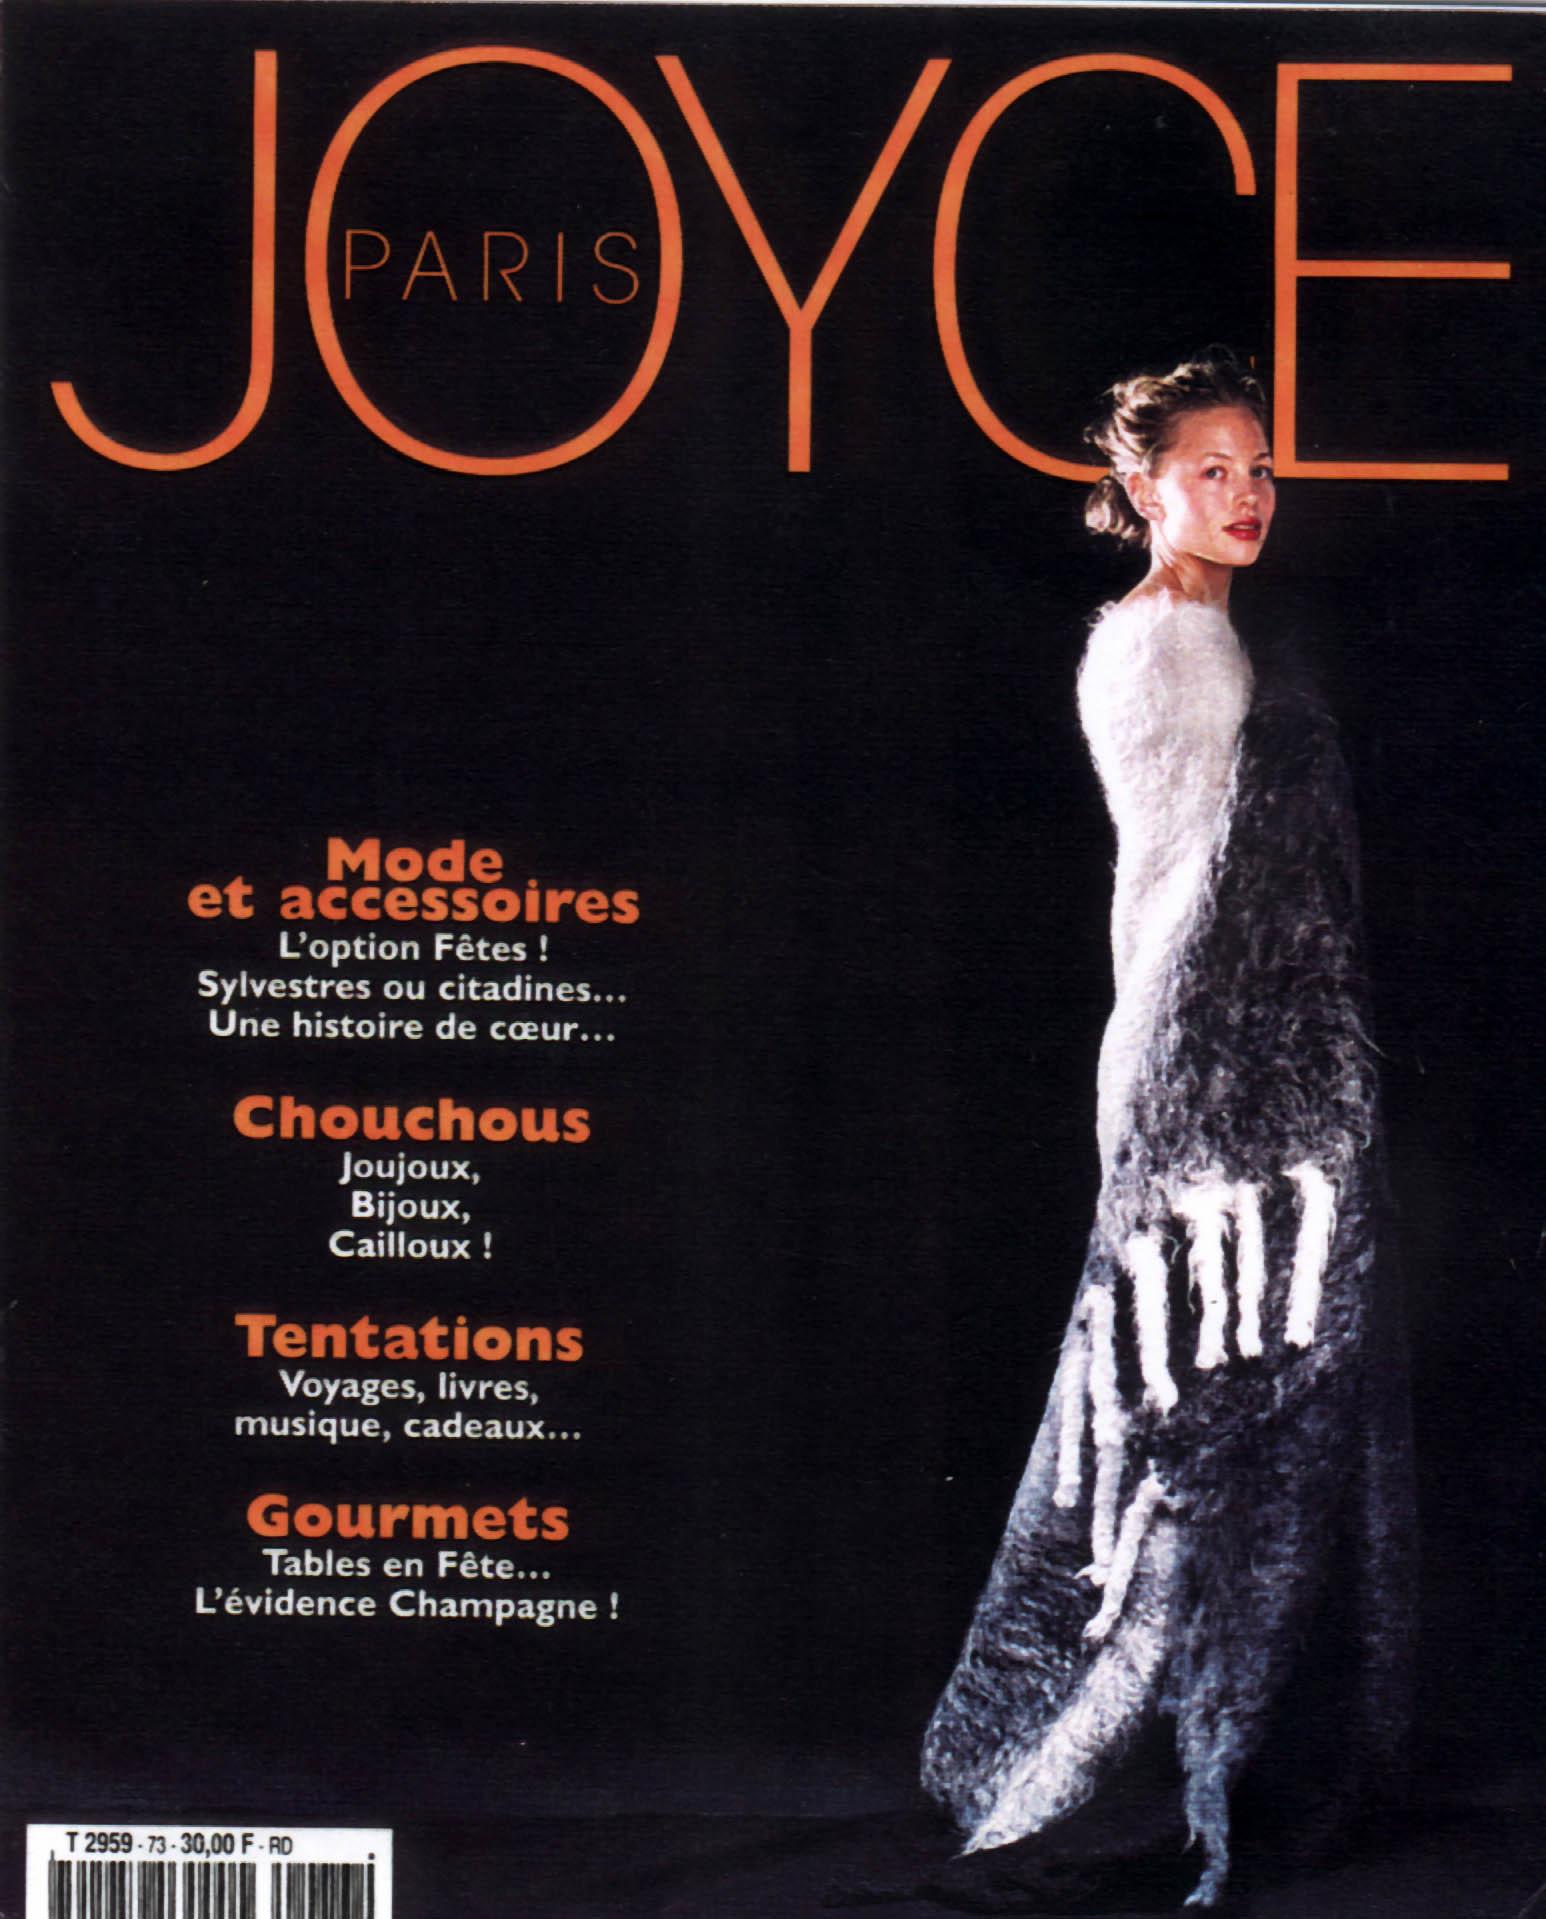 1998 Joyce Nov-Dec 98 Couve.jpg